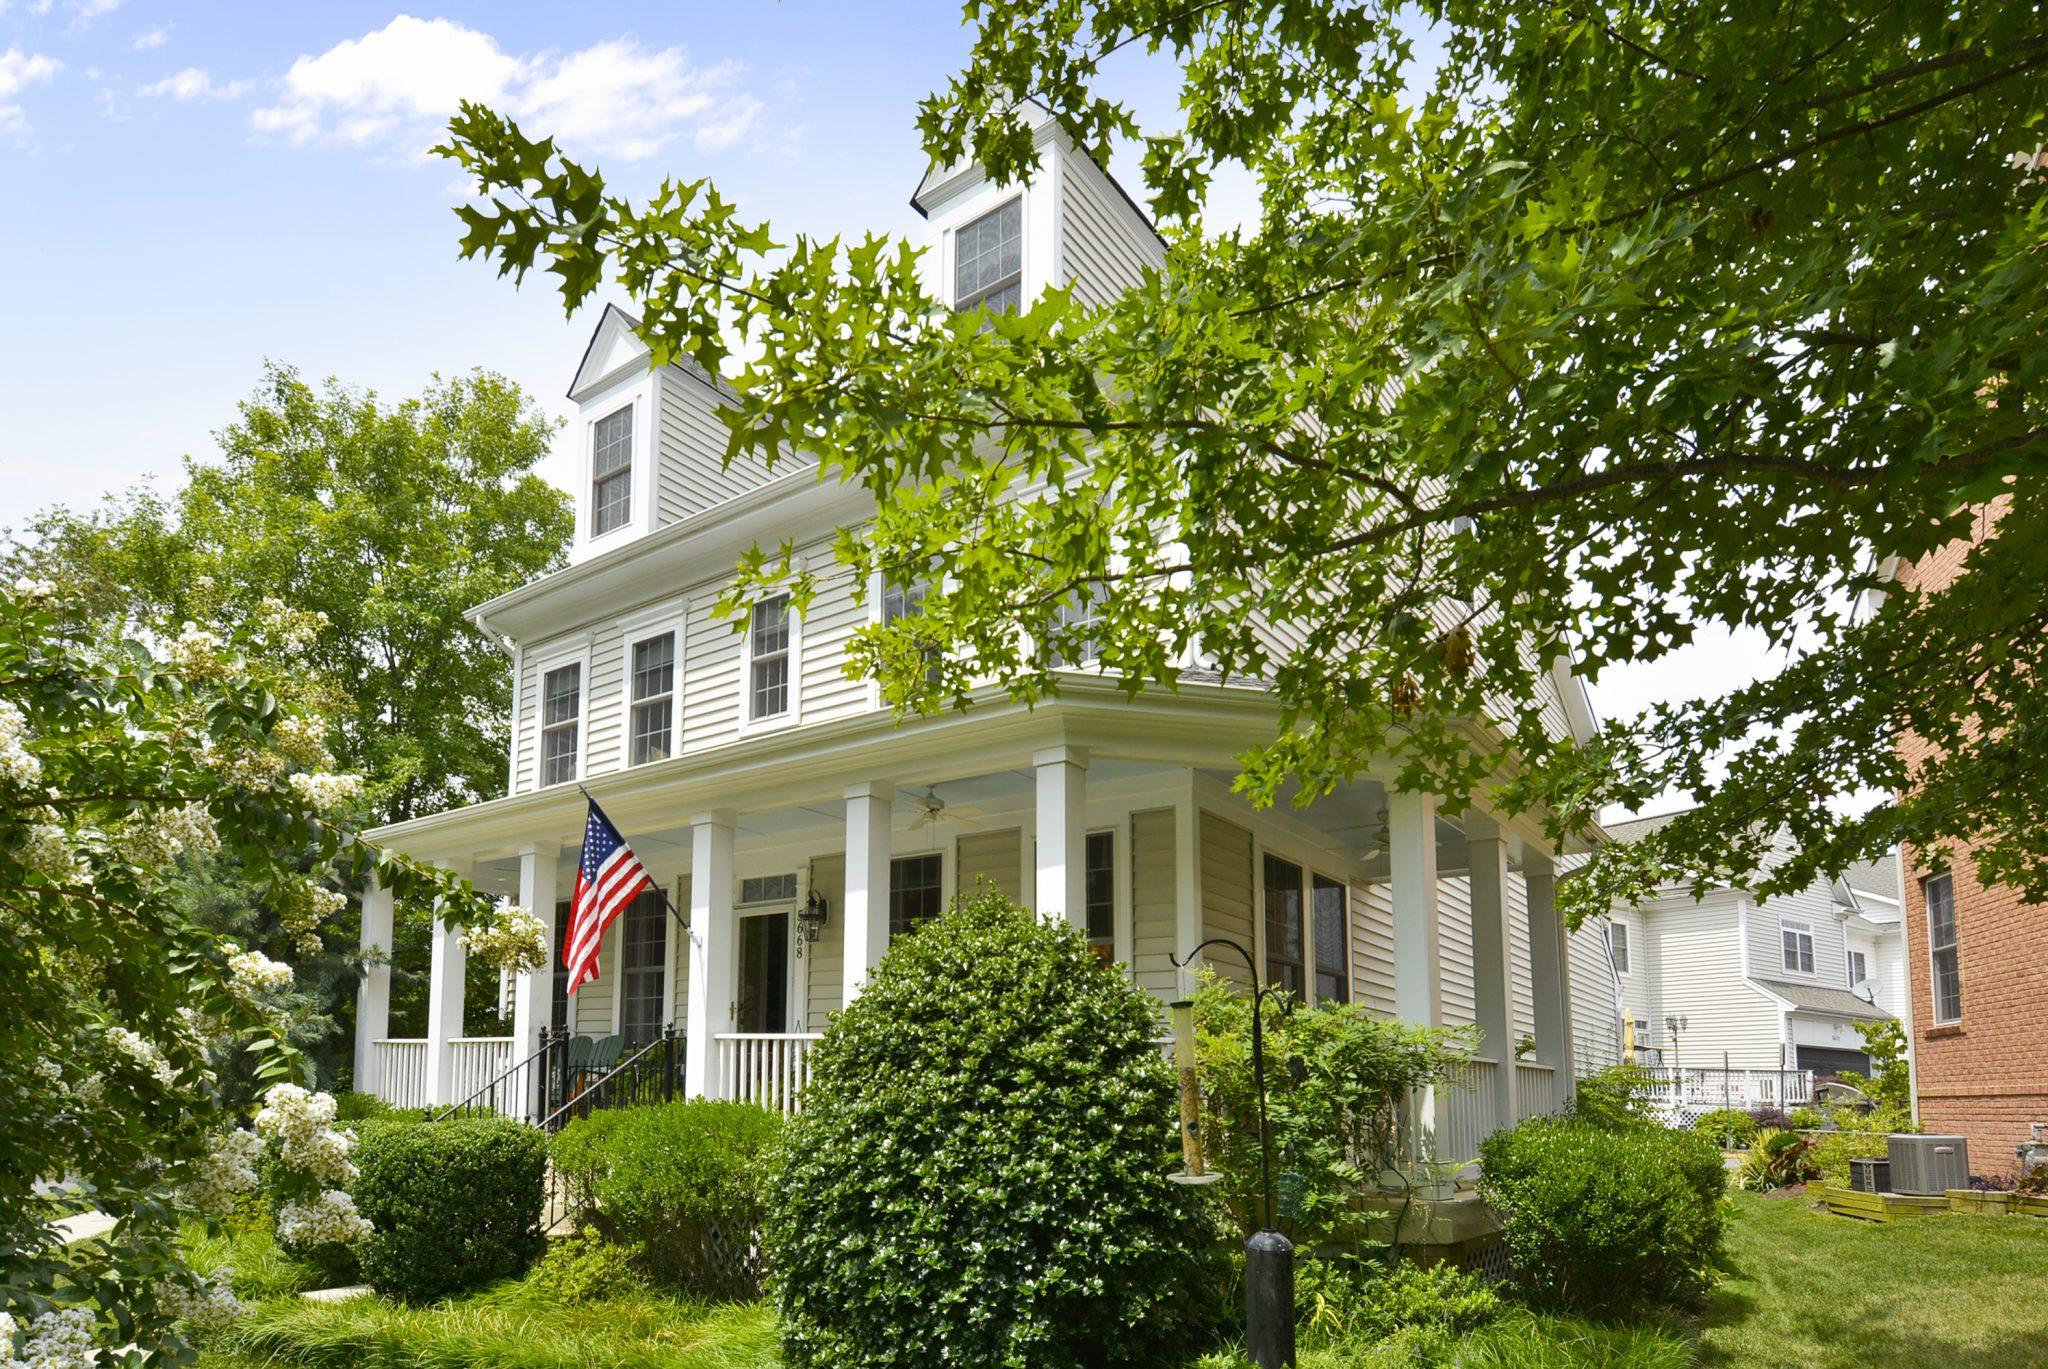 Exterior-Front Elevation-_DSC67105668 General Johnston Place Centreville VA Home For Sale | Candace Moe, REALTOR®